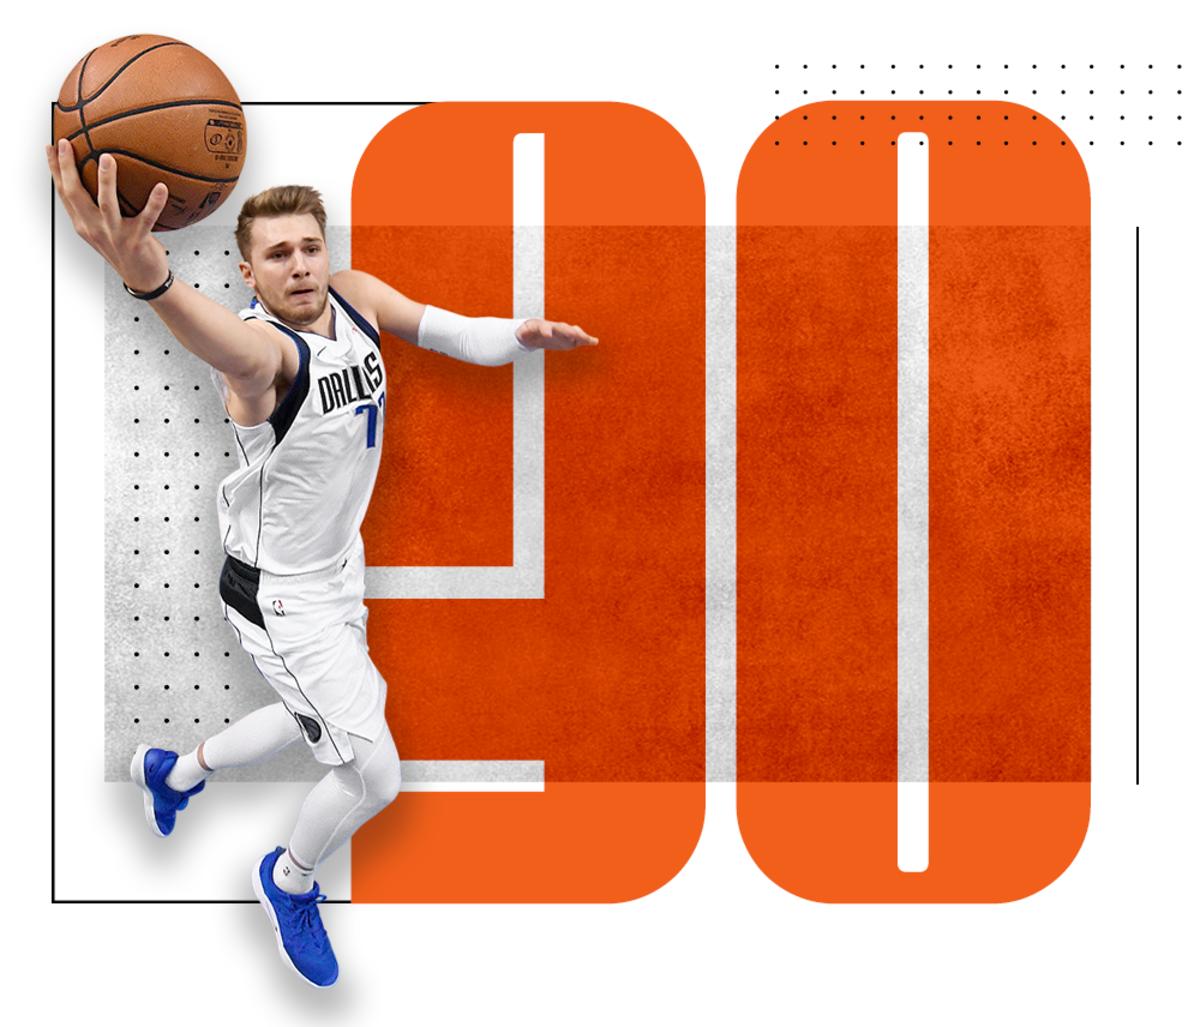 top-100-nba-players-2020-Luka-Doncic.png